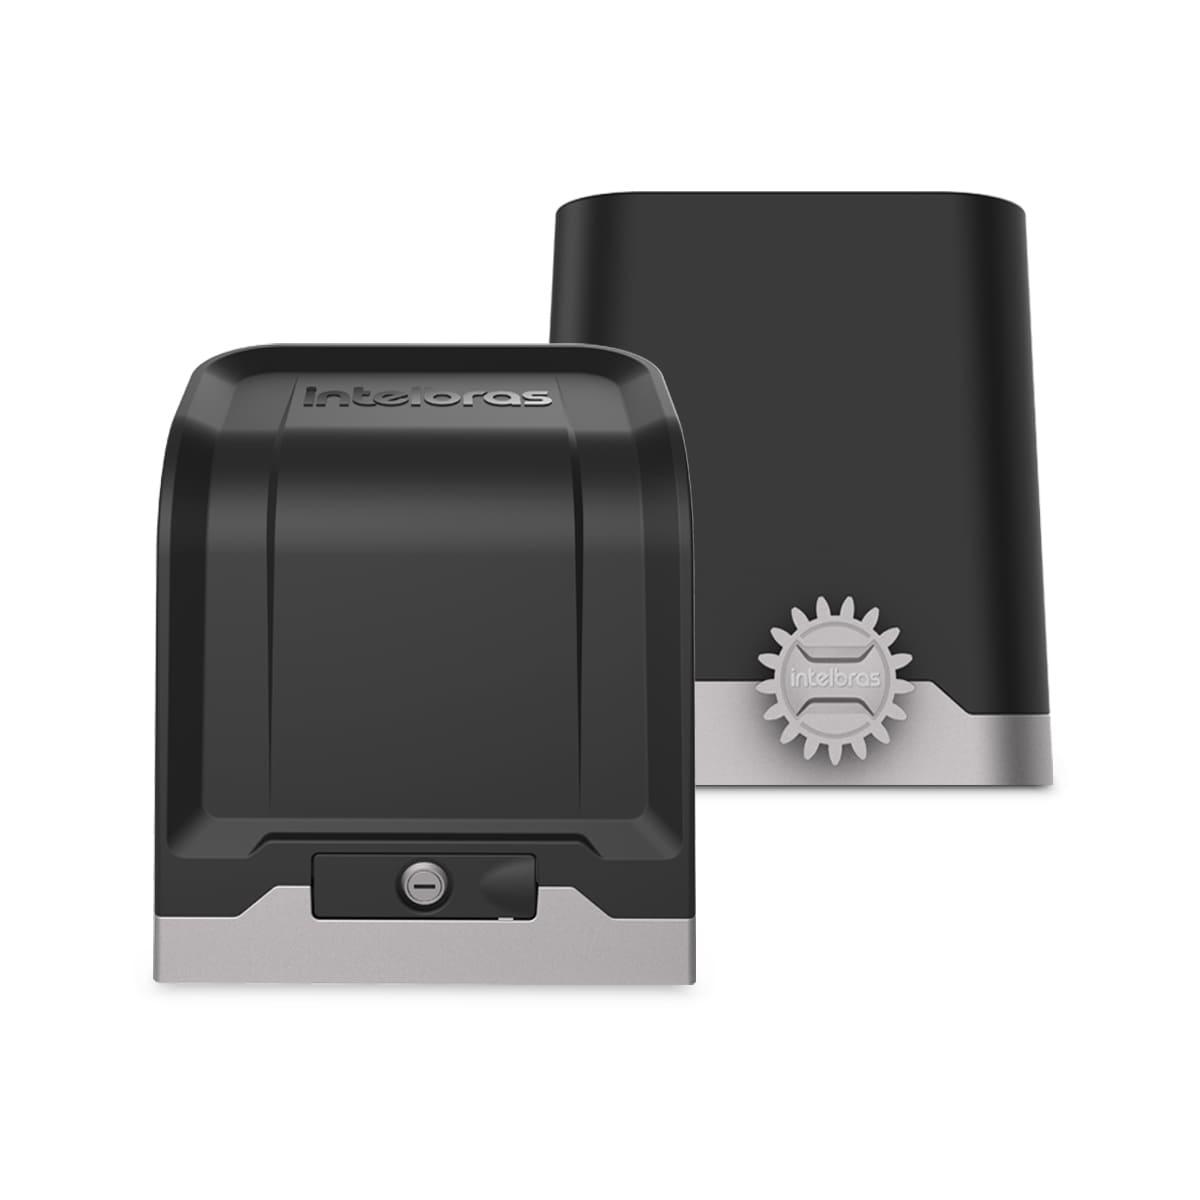 Kit Motor Para Portão Eletrônico Intelbras DR 400 AL 1/4 Hp